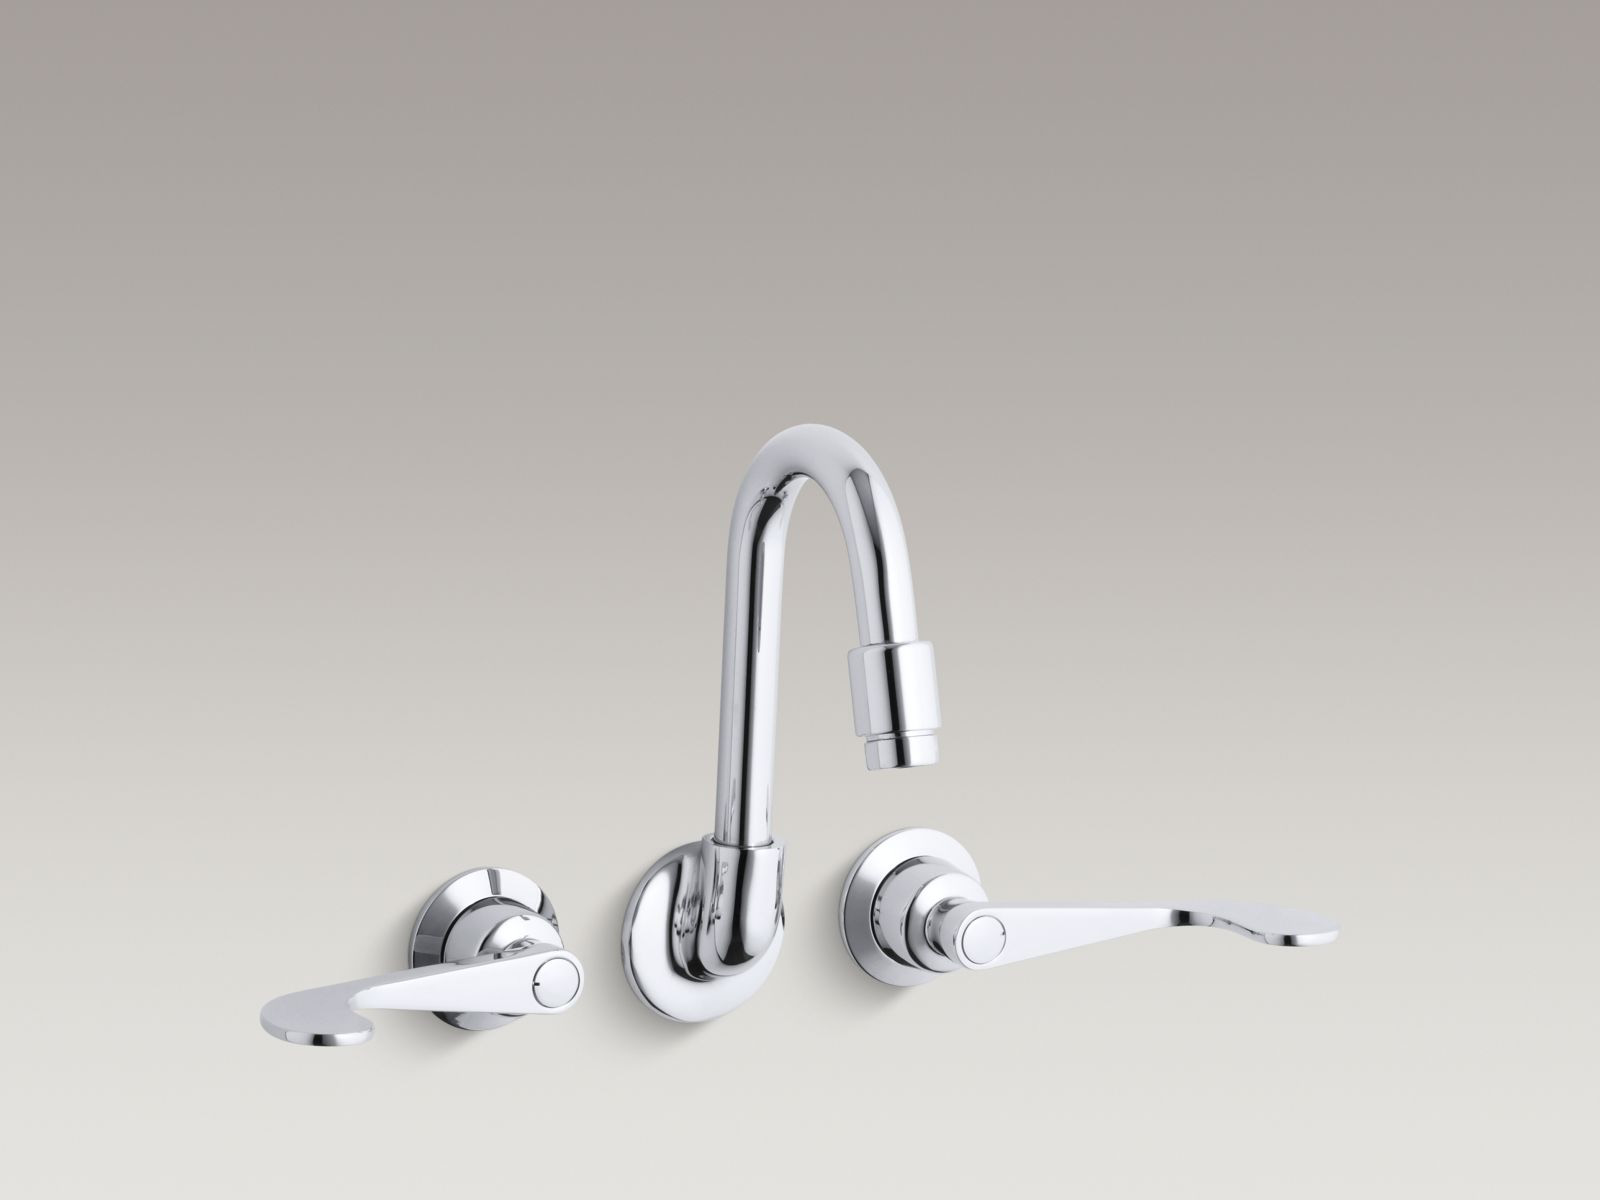 Kohler K 7302 5a Cp Triton Shelf Back Double Wristblade Lever Handle Sink Faucet Polished Chrome